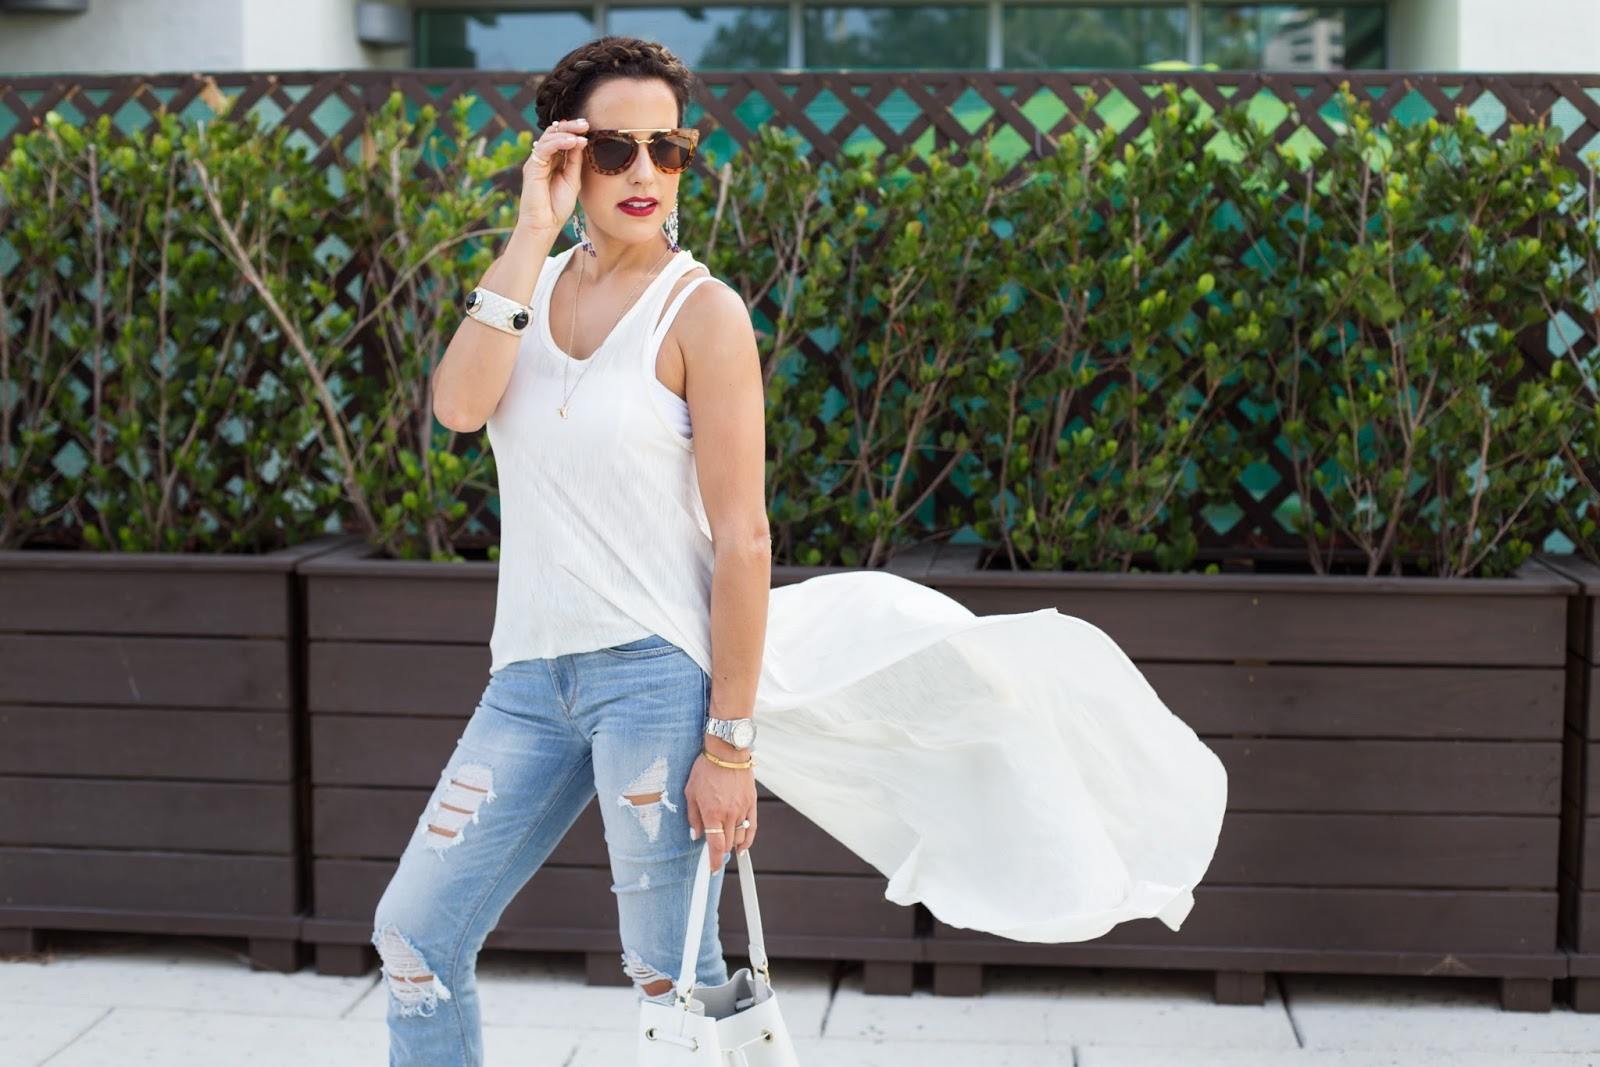 Distressed Jeans White Tank Top Fashion Blogger Kelly Saks